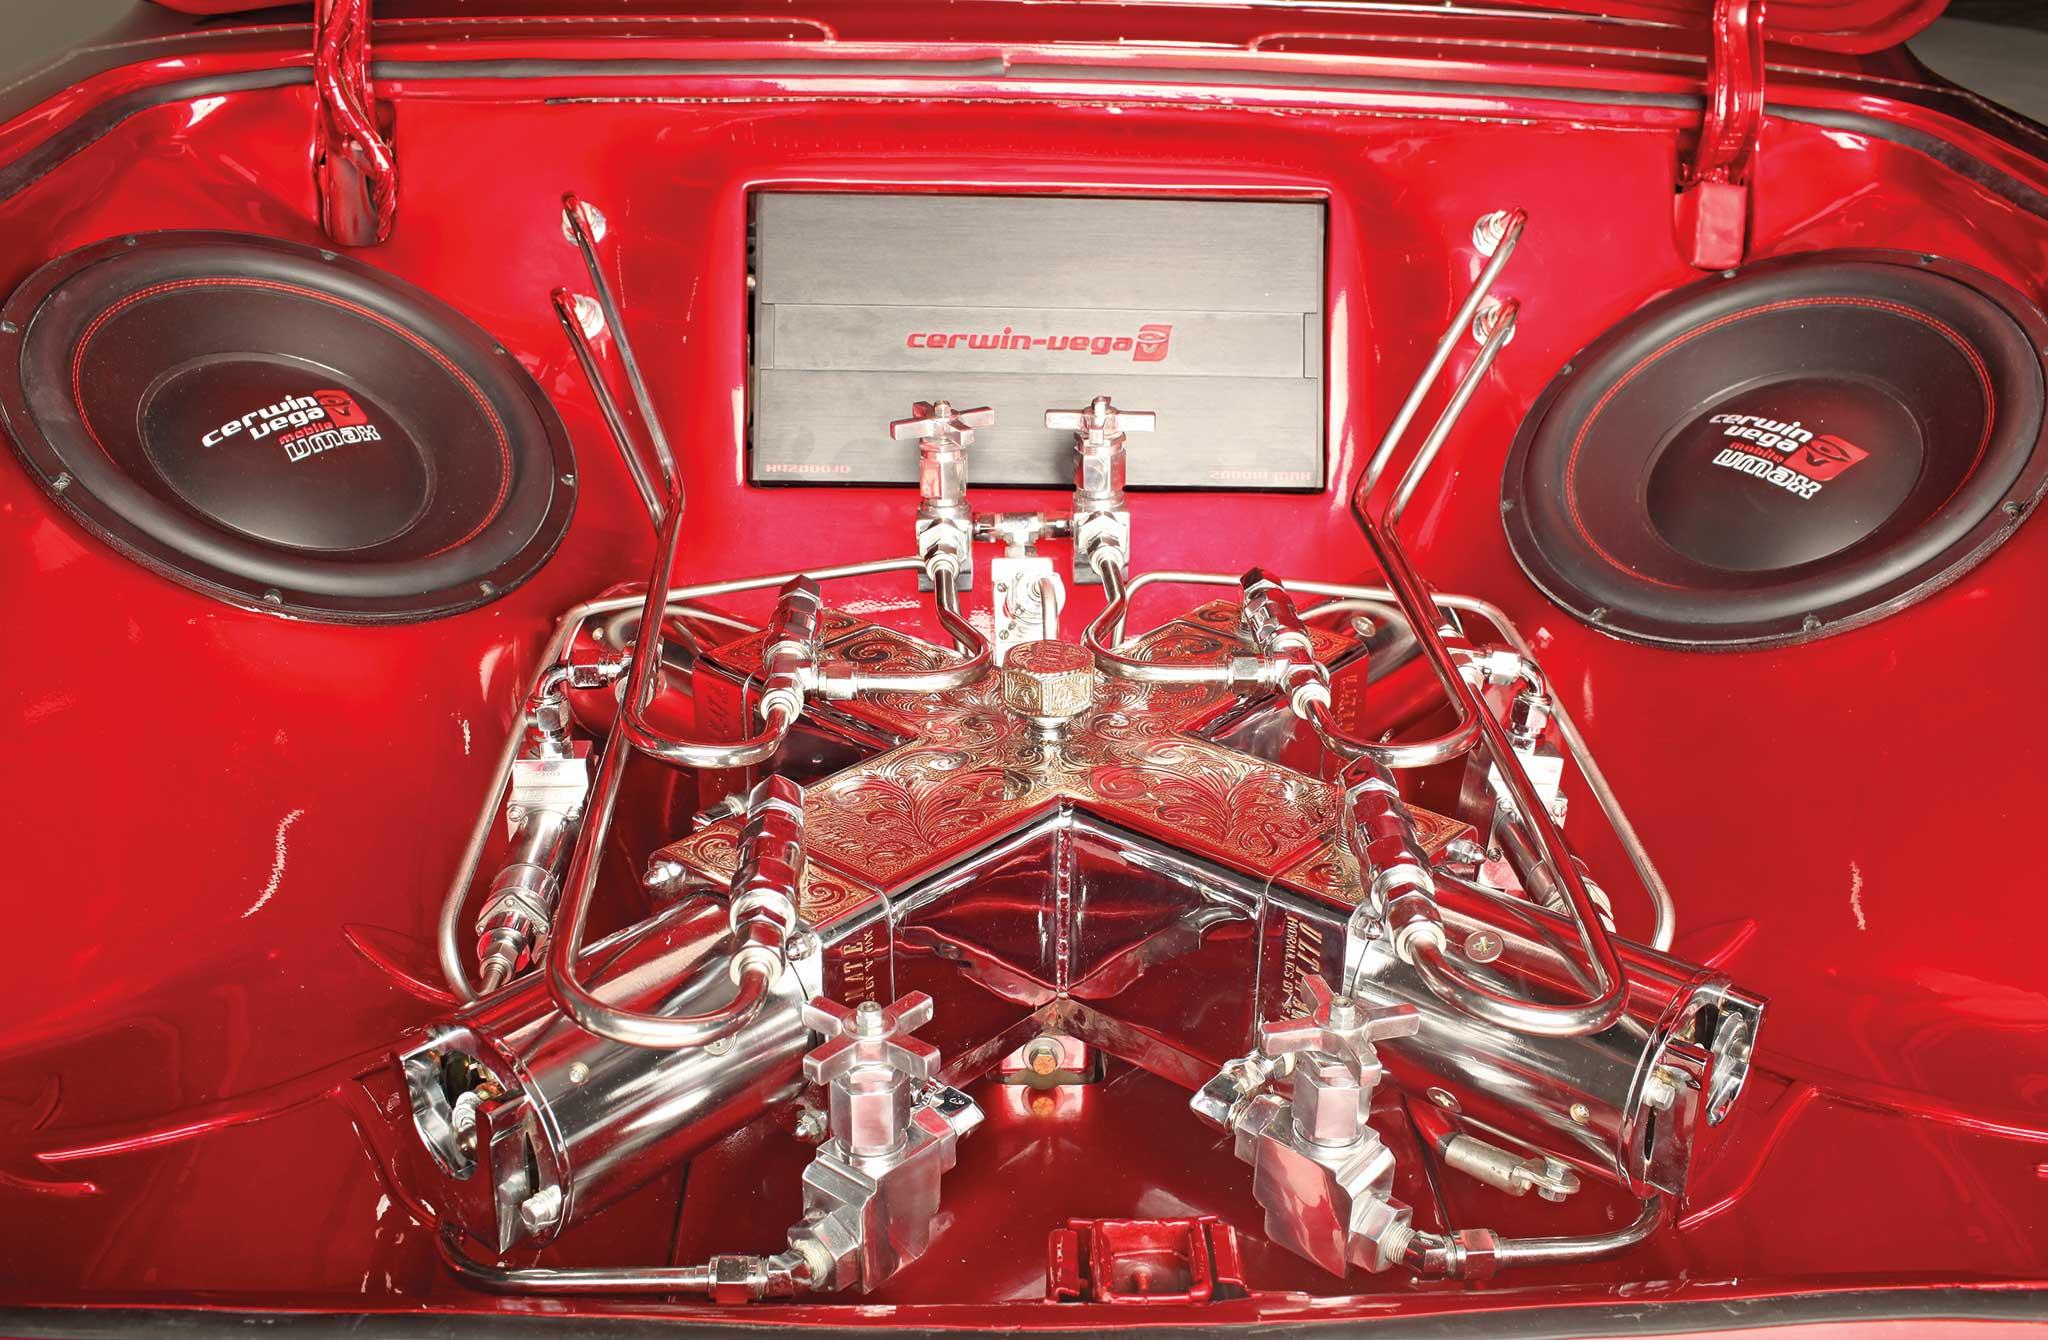 005 1961 chevrolet impala convertible hydraulics pump setup